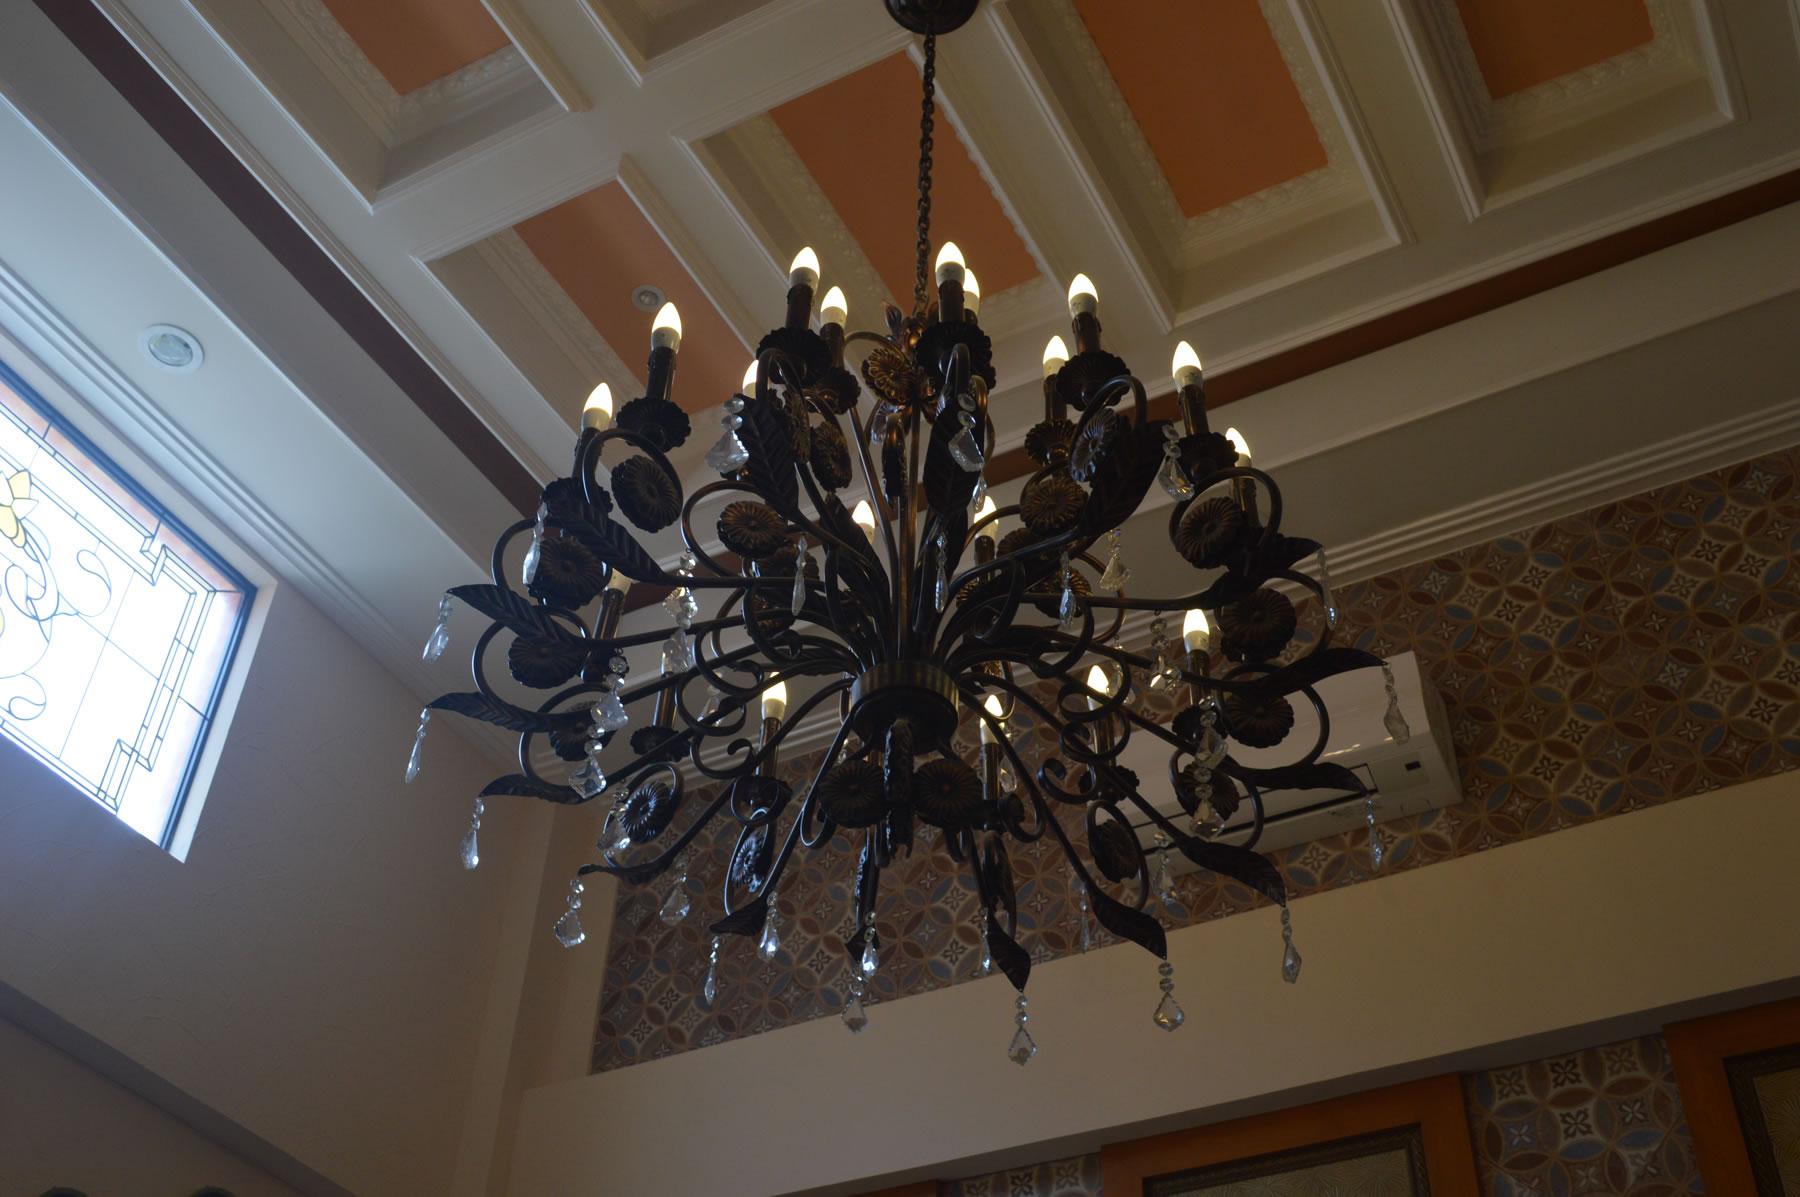 Candle Light Chandelier Cavitetrail Glass Railings